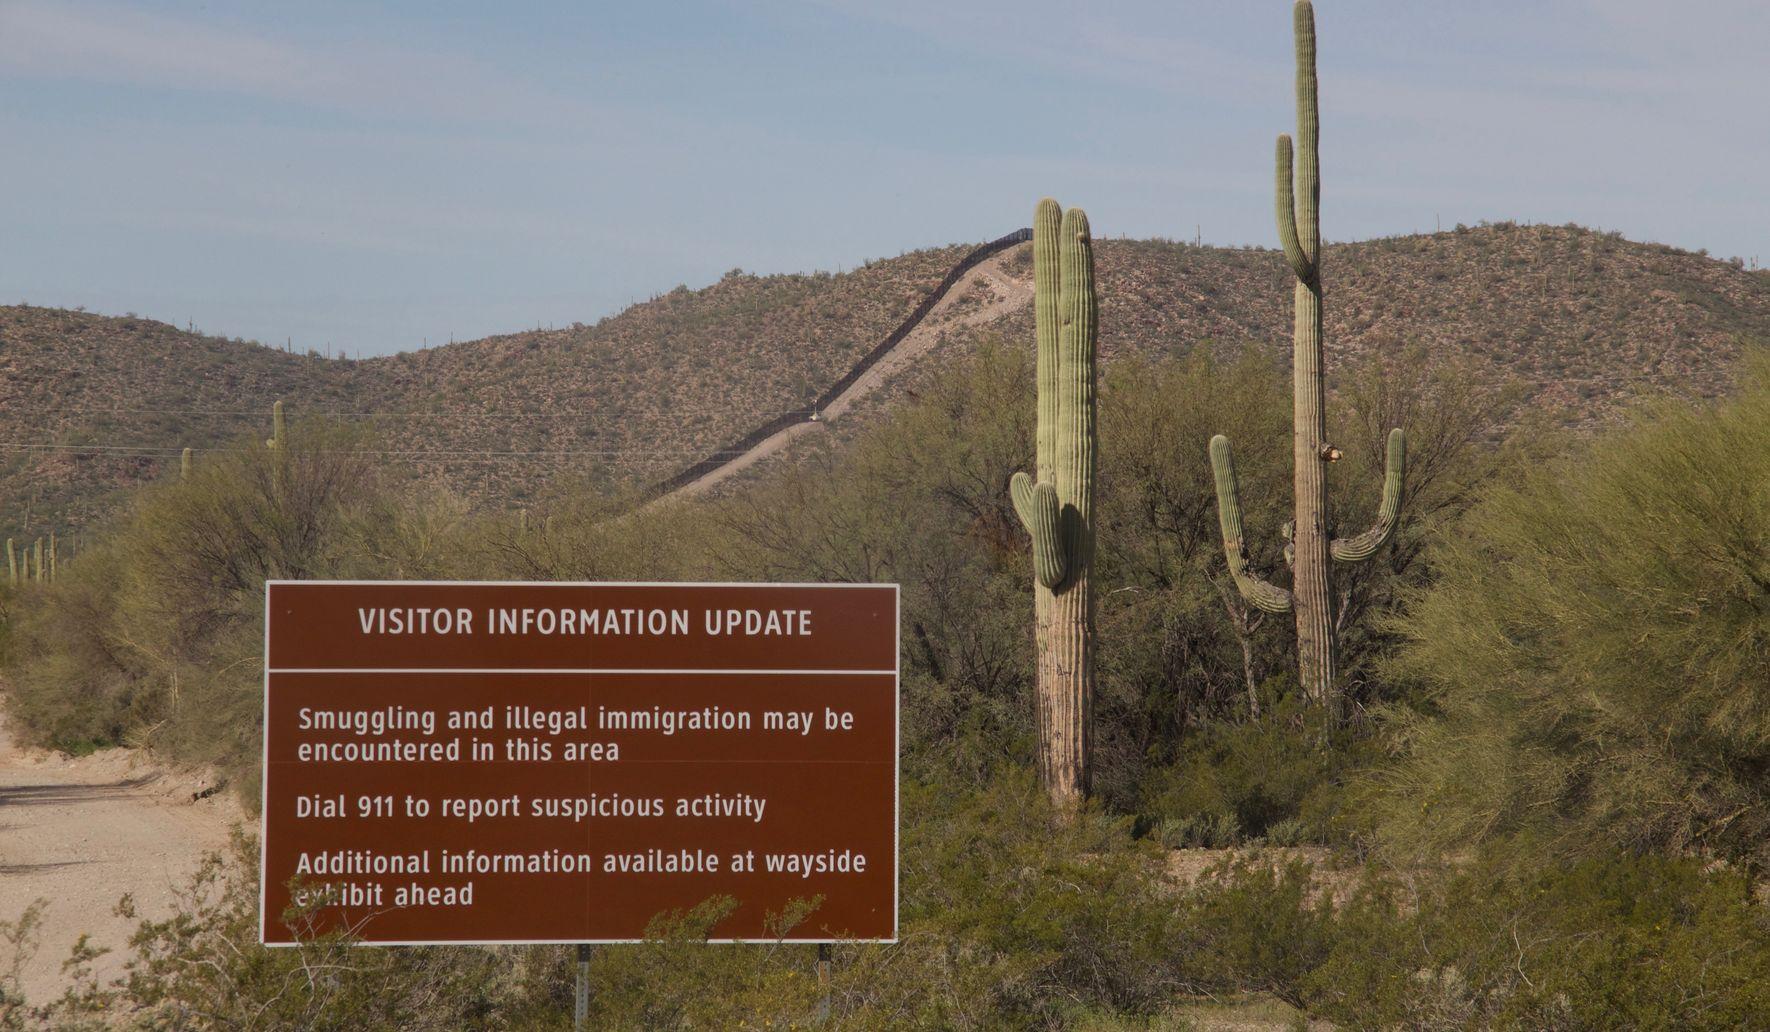 Successful border enforcement saves habitat, visitor security on National Park Service land